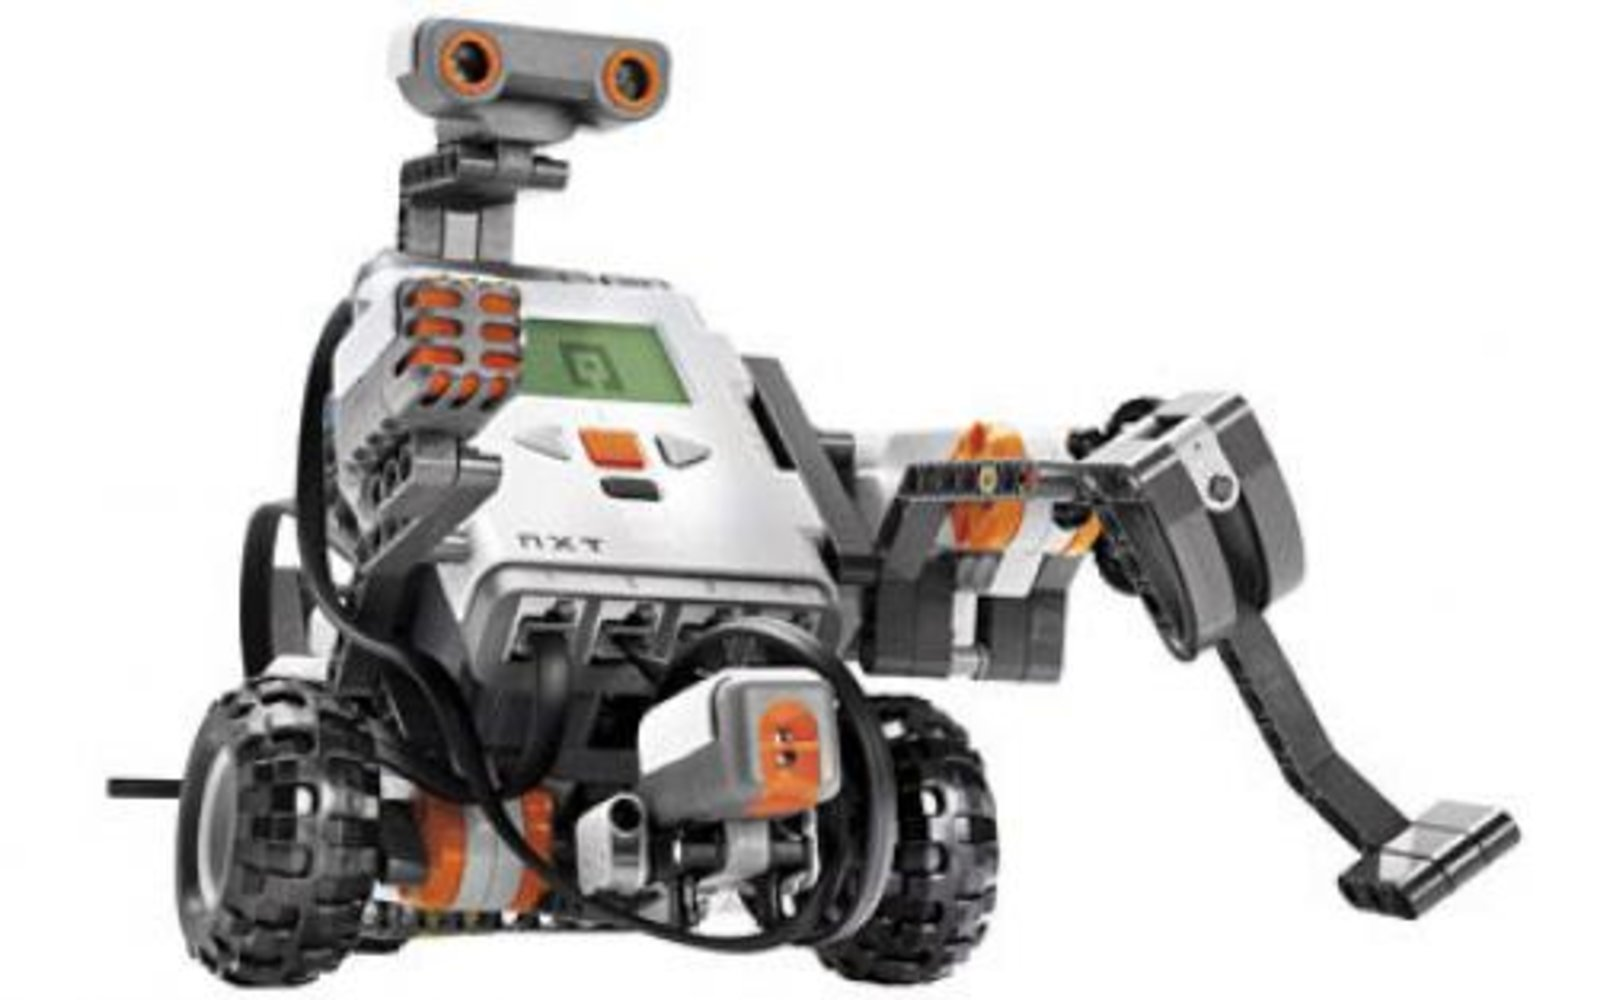 Mindstorms Education NXT Base Set